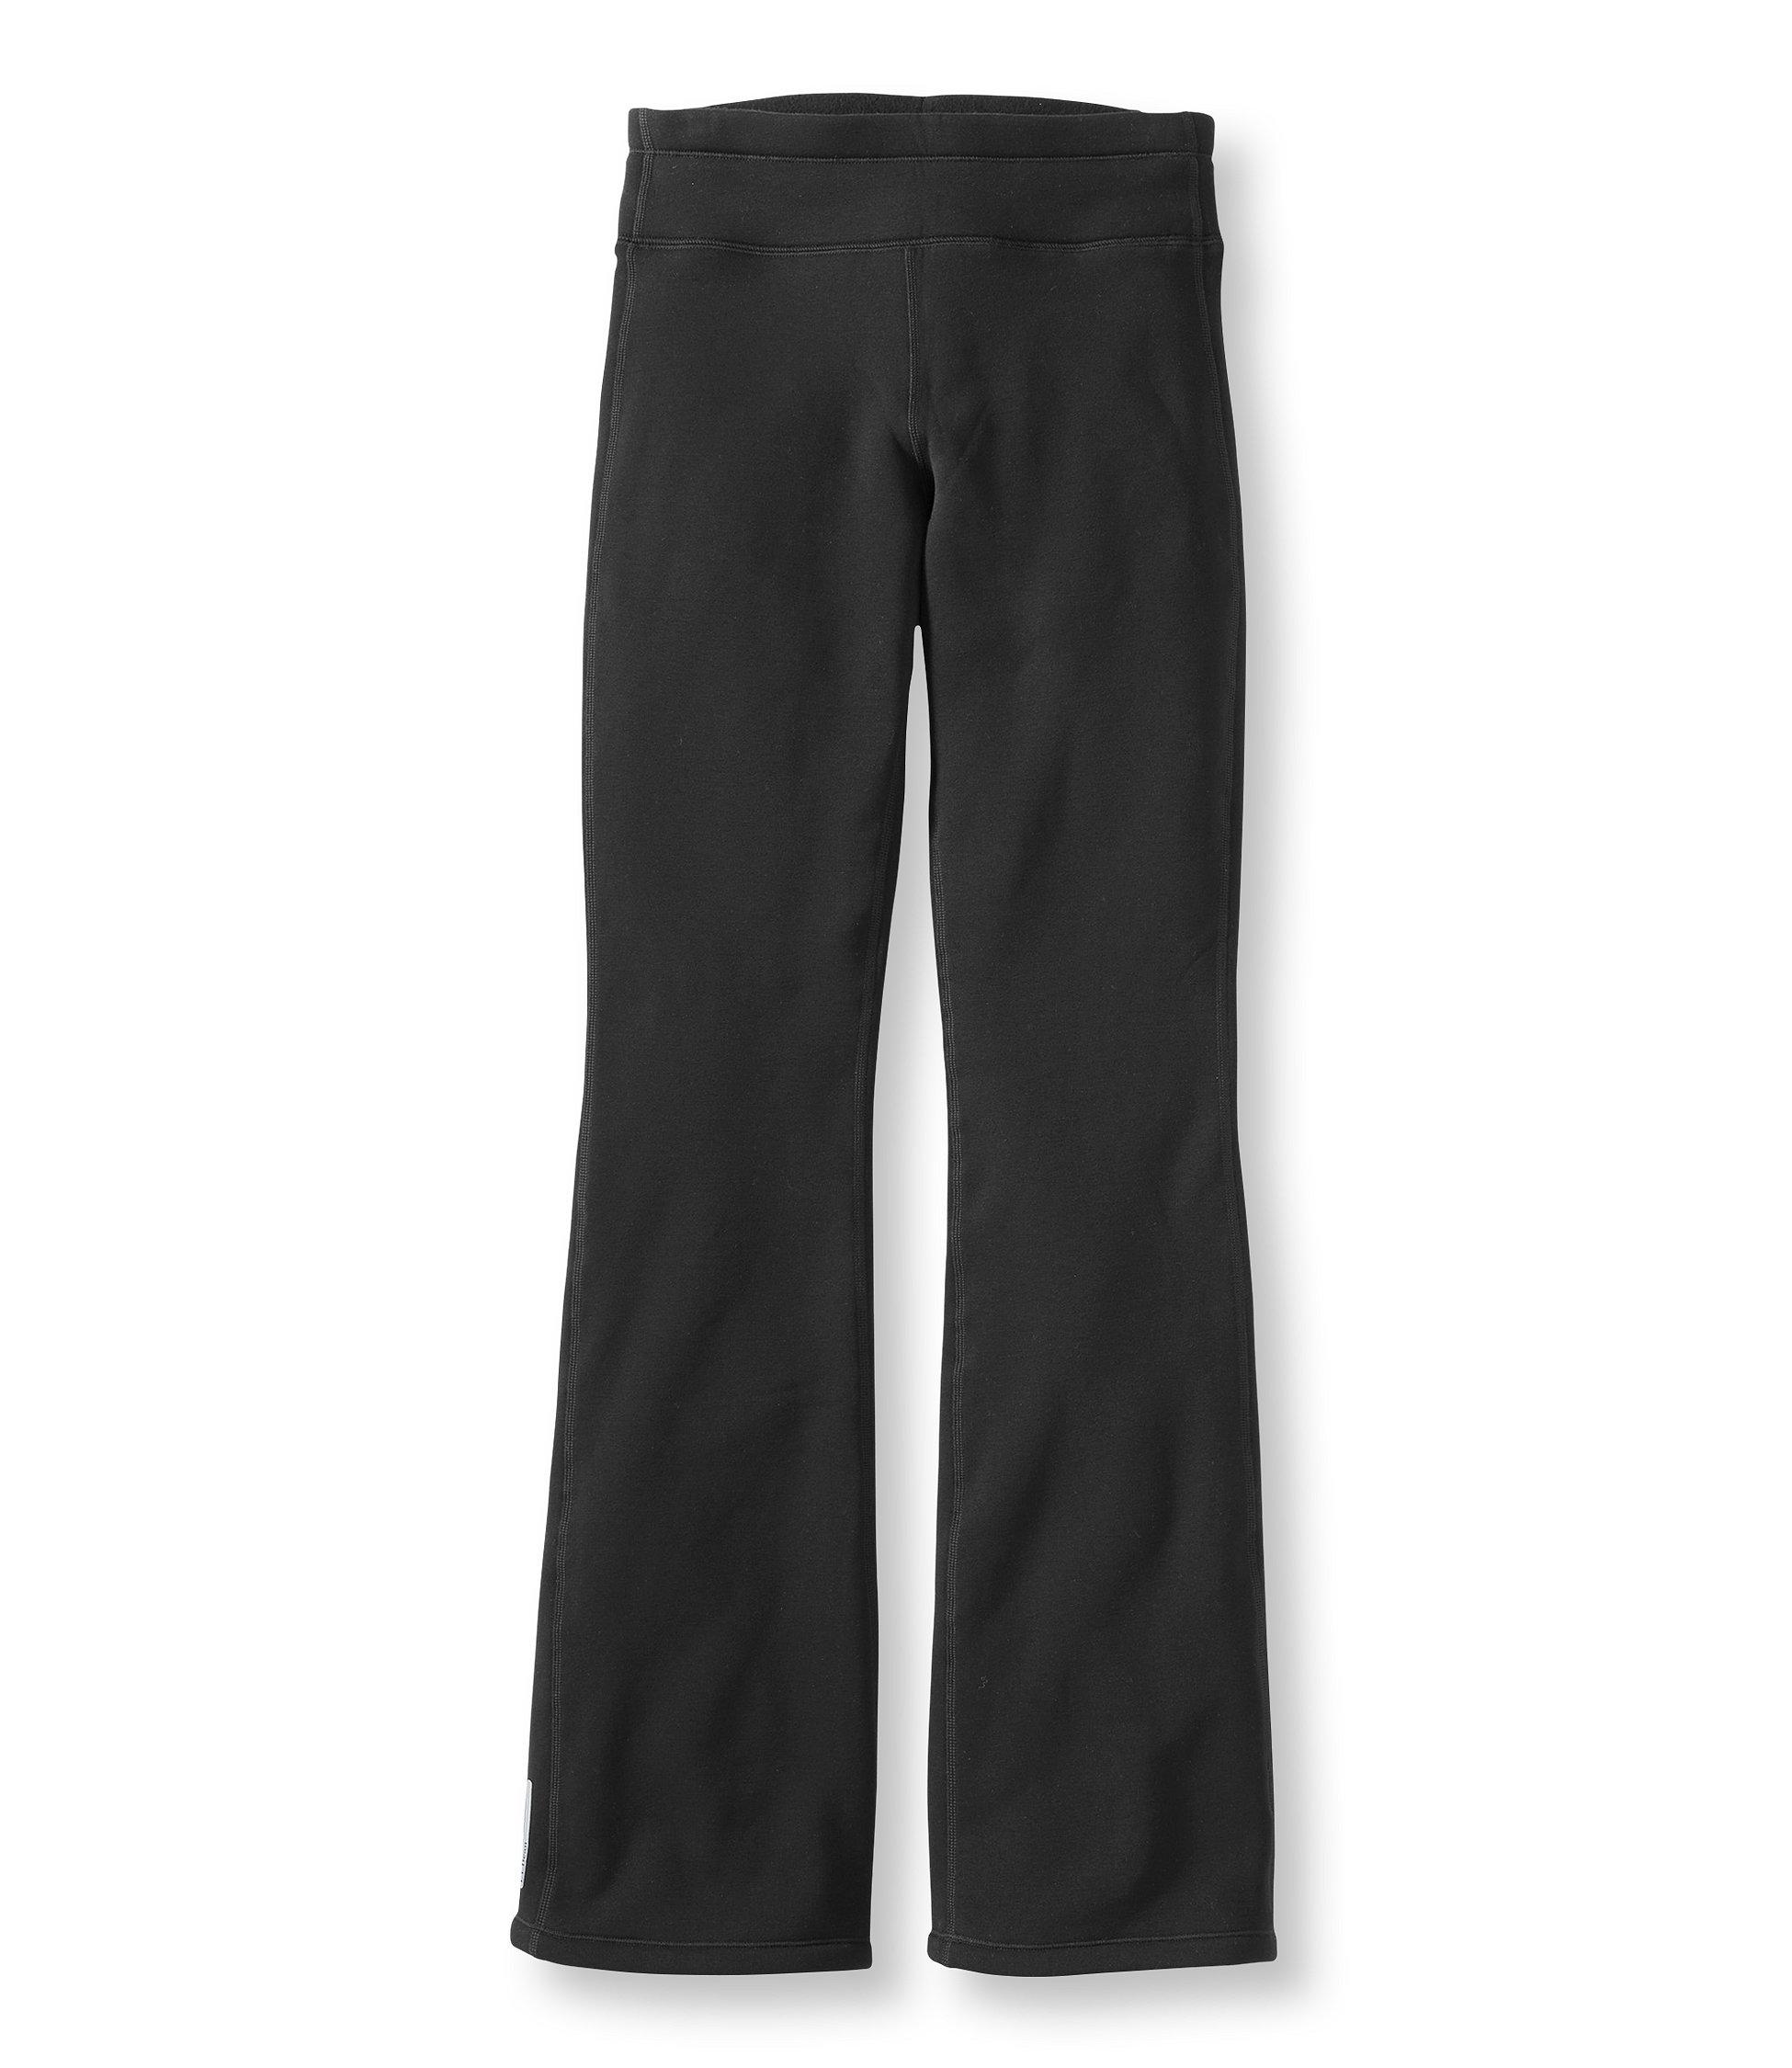 L.L.Bean Polartec PowerStretch Pants